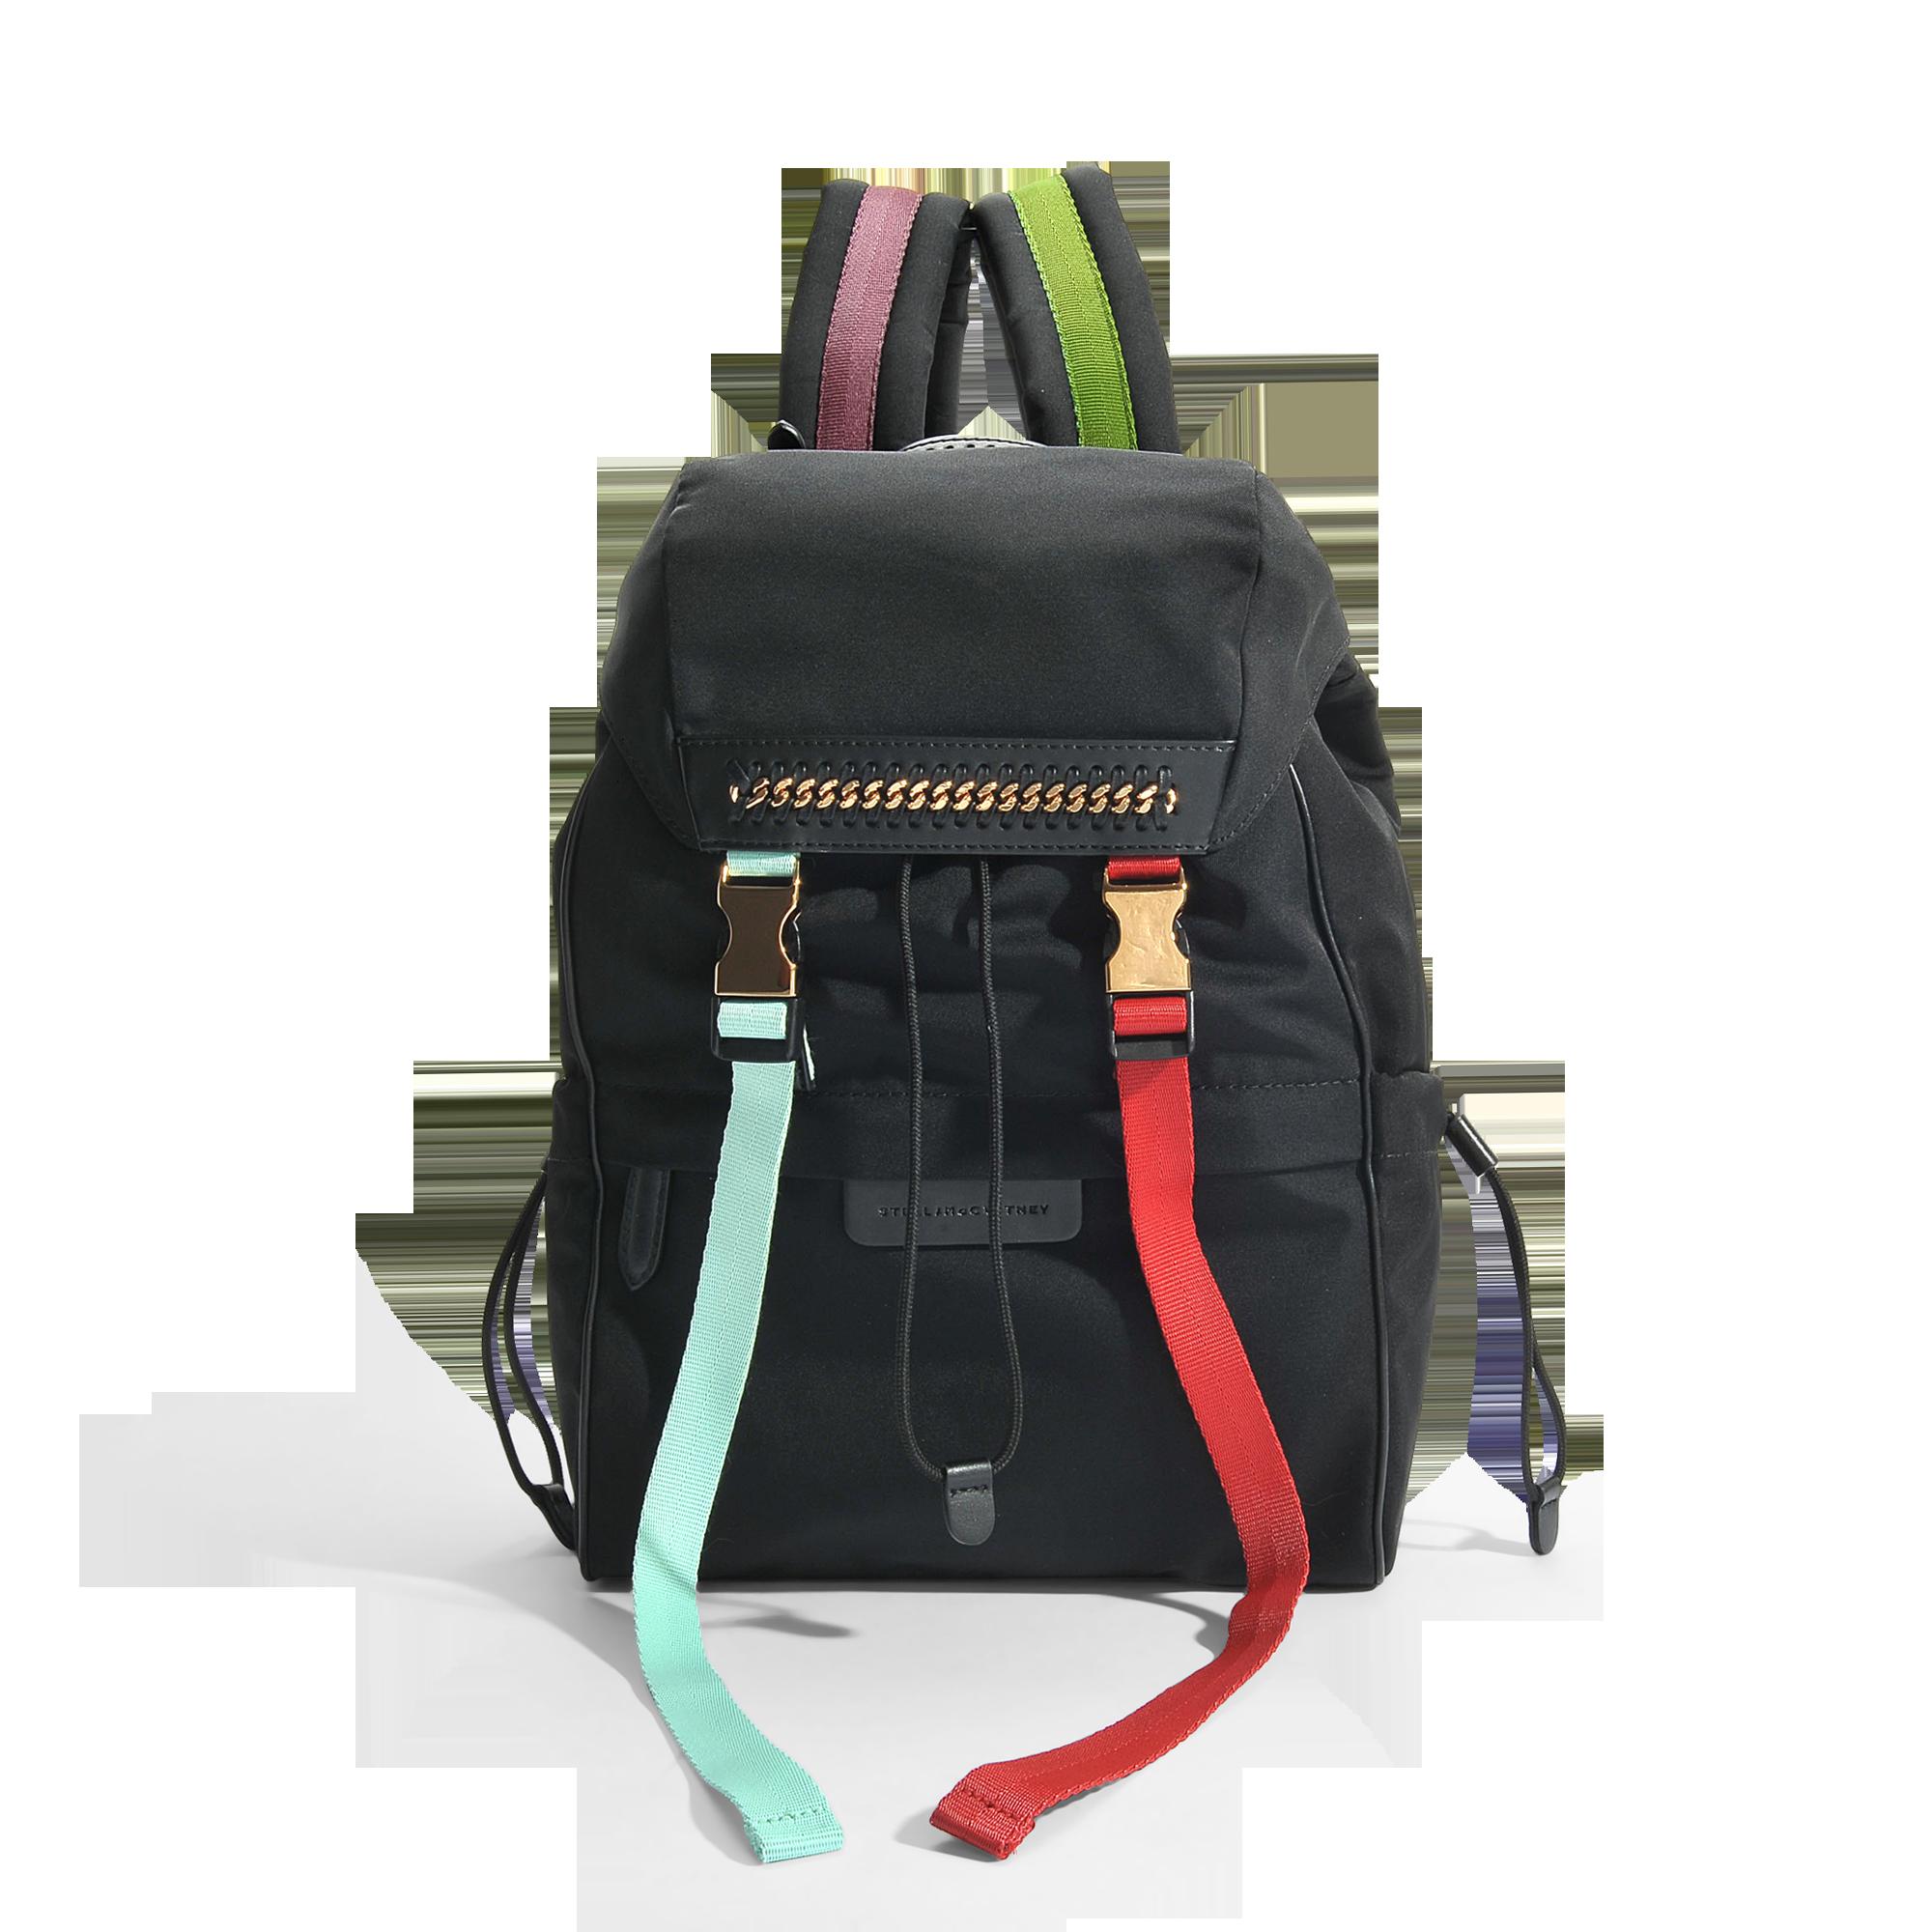 Stella Mccartney Eco Nylon Backpack Falabella Go In Nederland Online Goedkoopste Korting Populair Goedkope Koop Deals vkgQRTvxdd